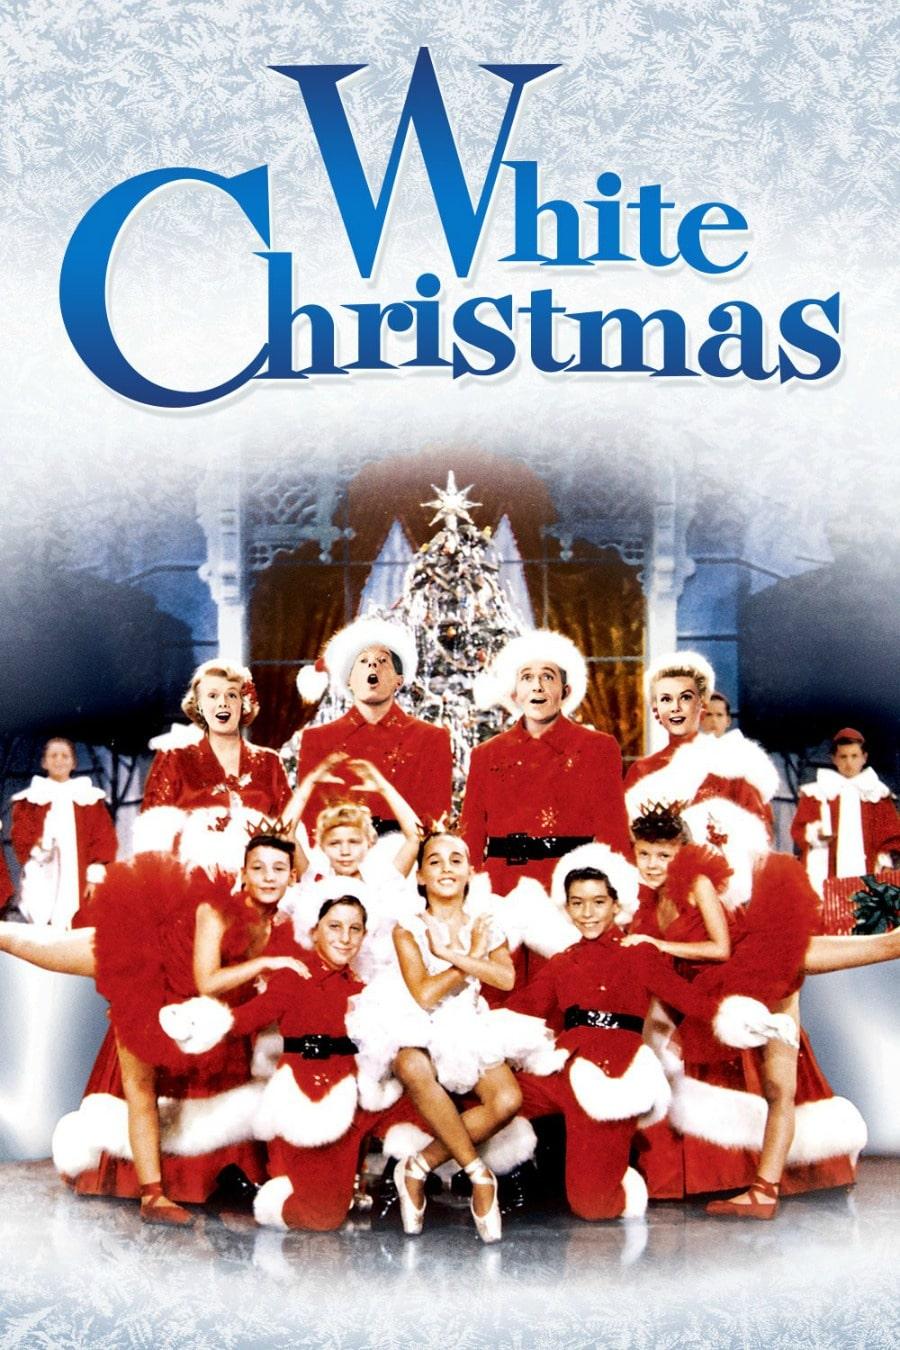 25 Days of Christmas Movies on Netflix